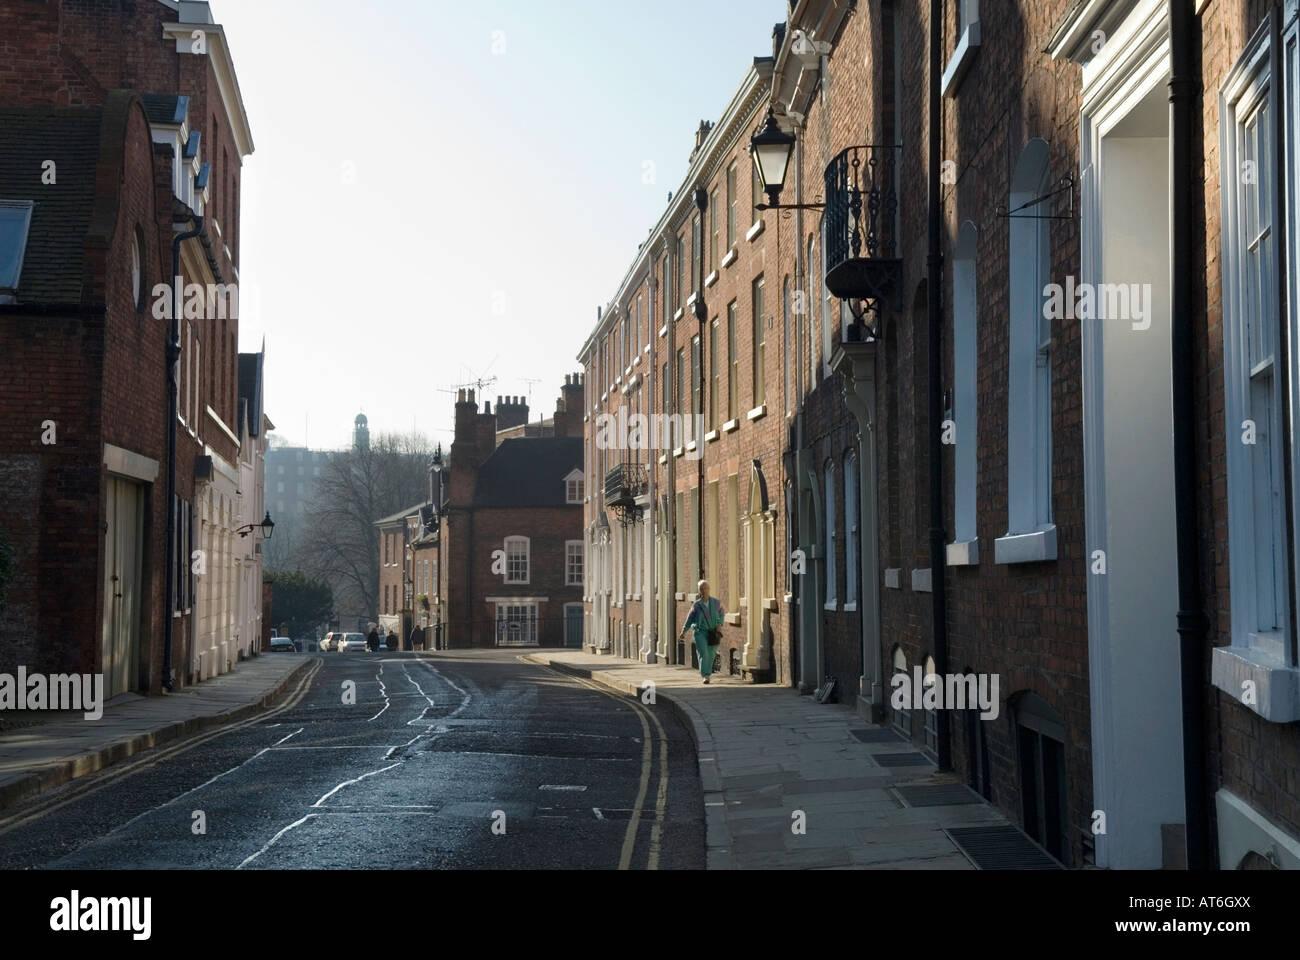 St John's Hill, looking towards Shrewsbury School, Shrewsbury, Shropshire - Stock Image